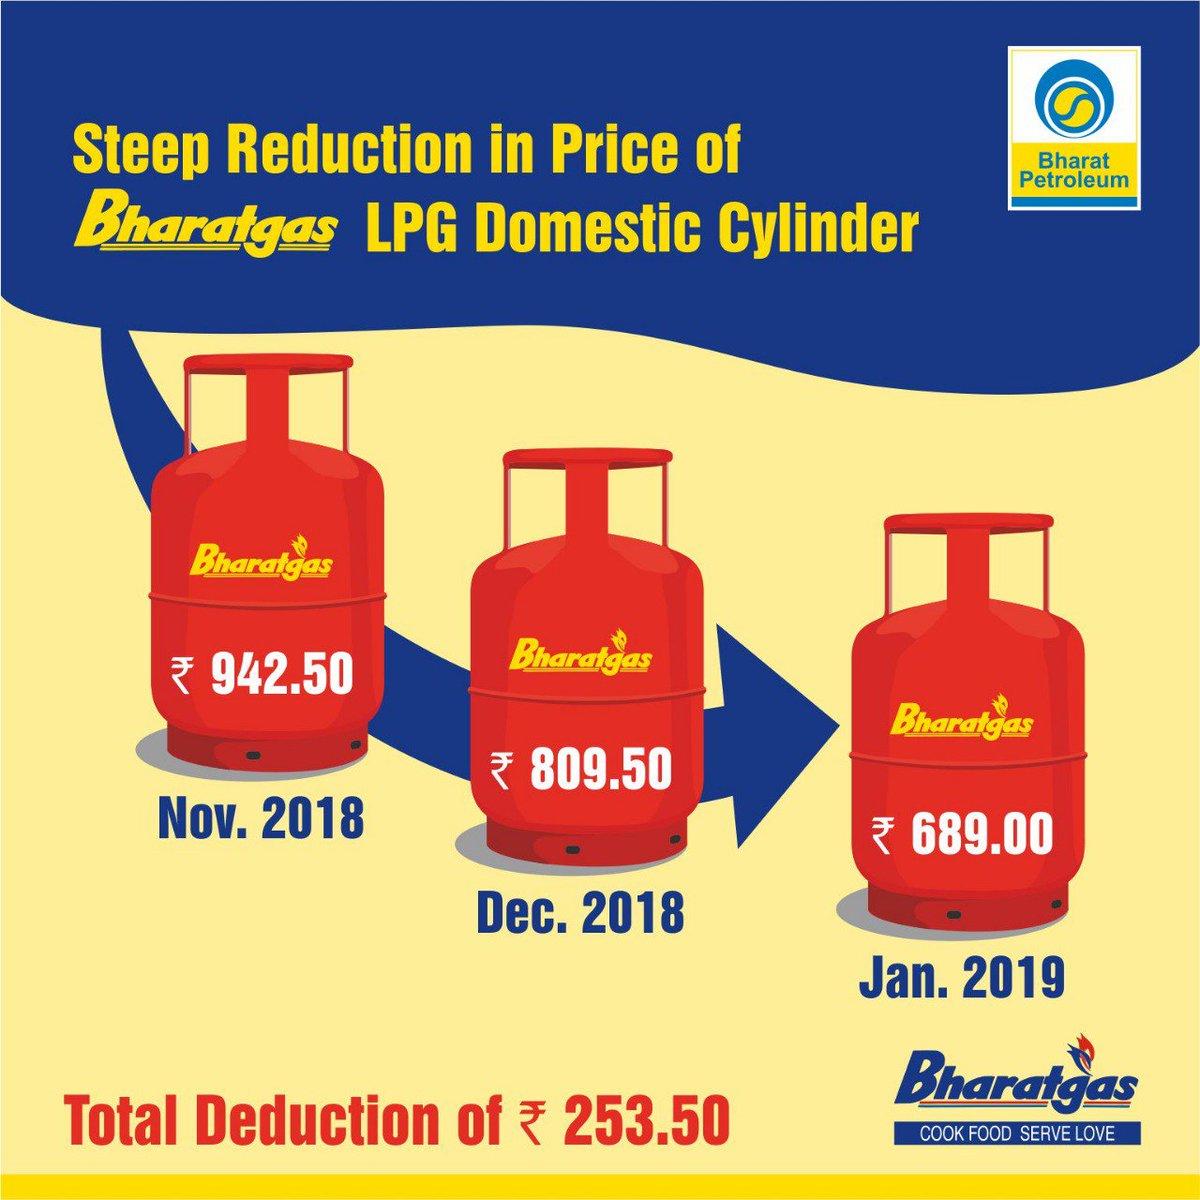 Bharatgas price